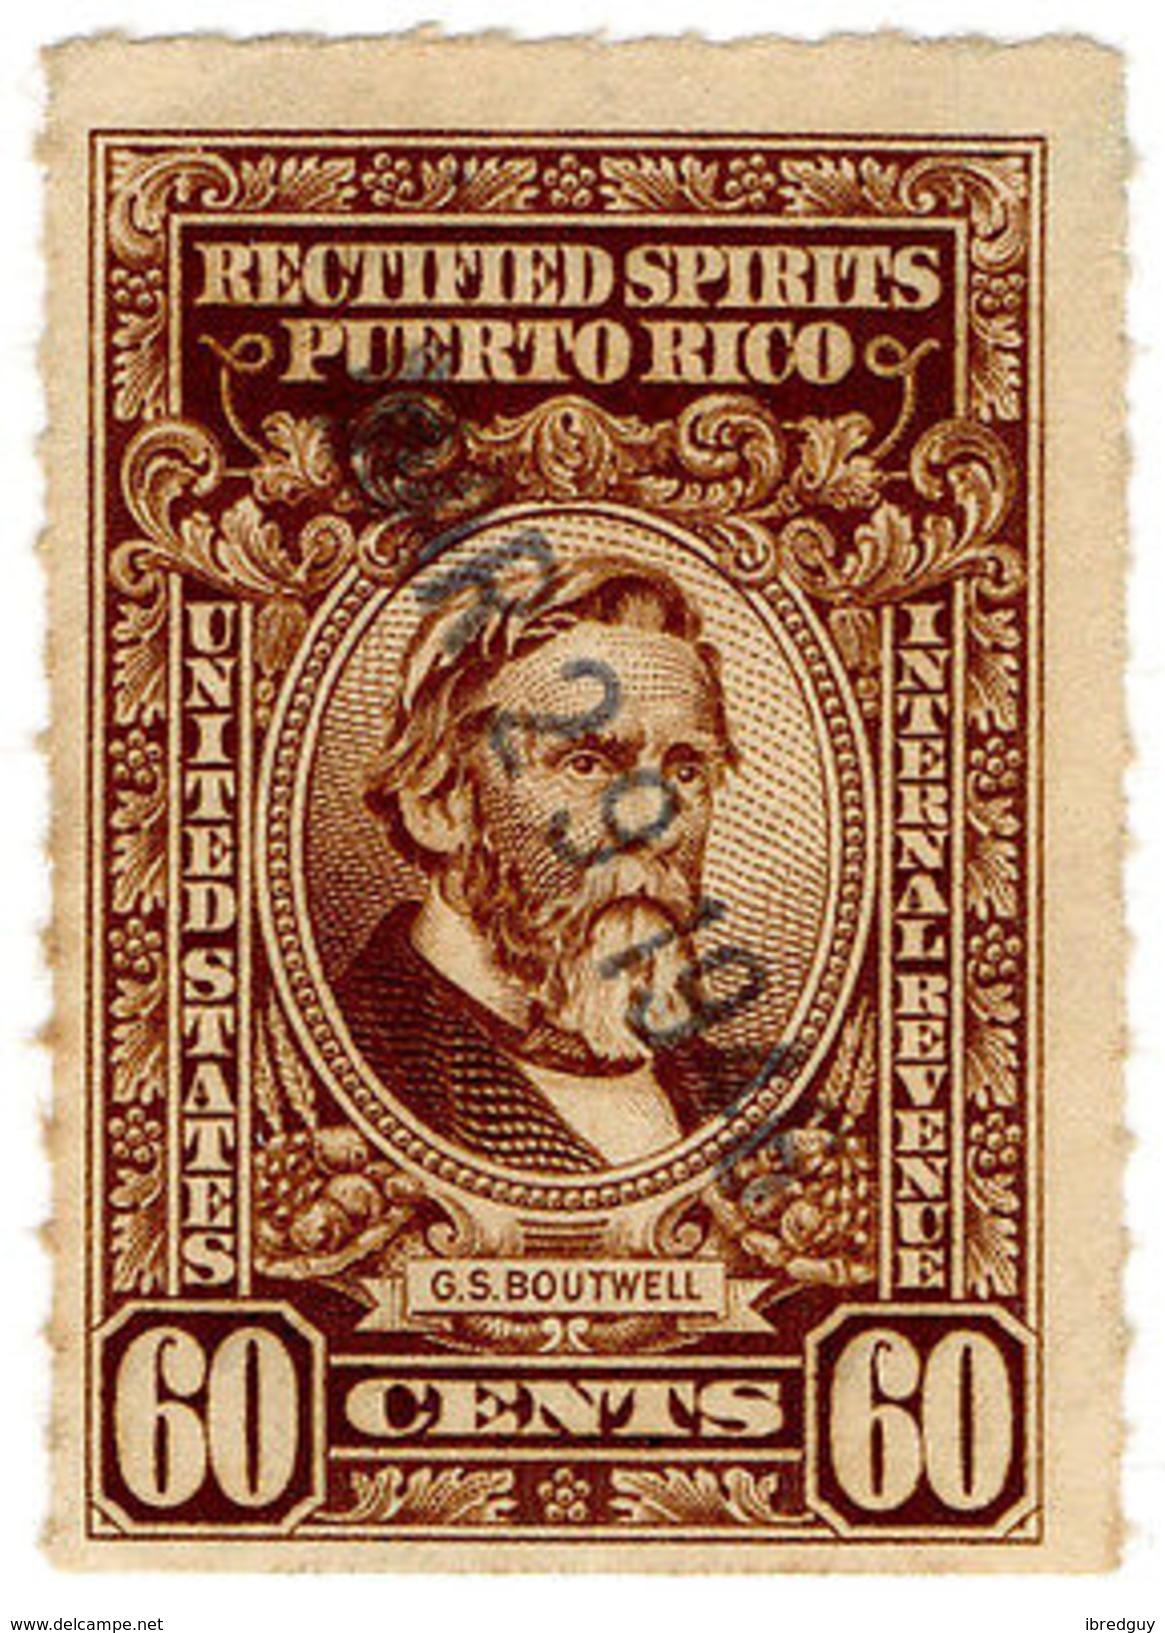 (I.B) Puerto Rico Revenue : Rectified Spirits 60c - United States